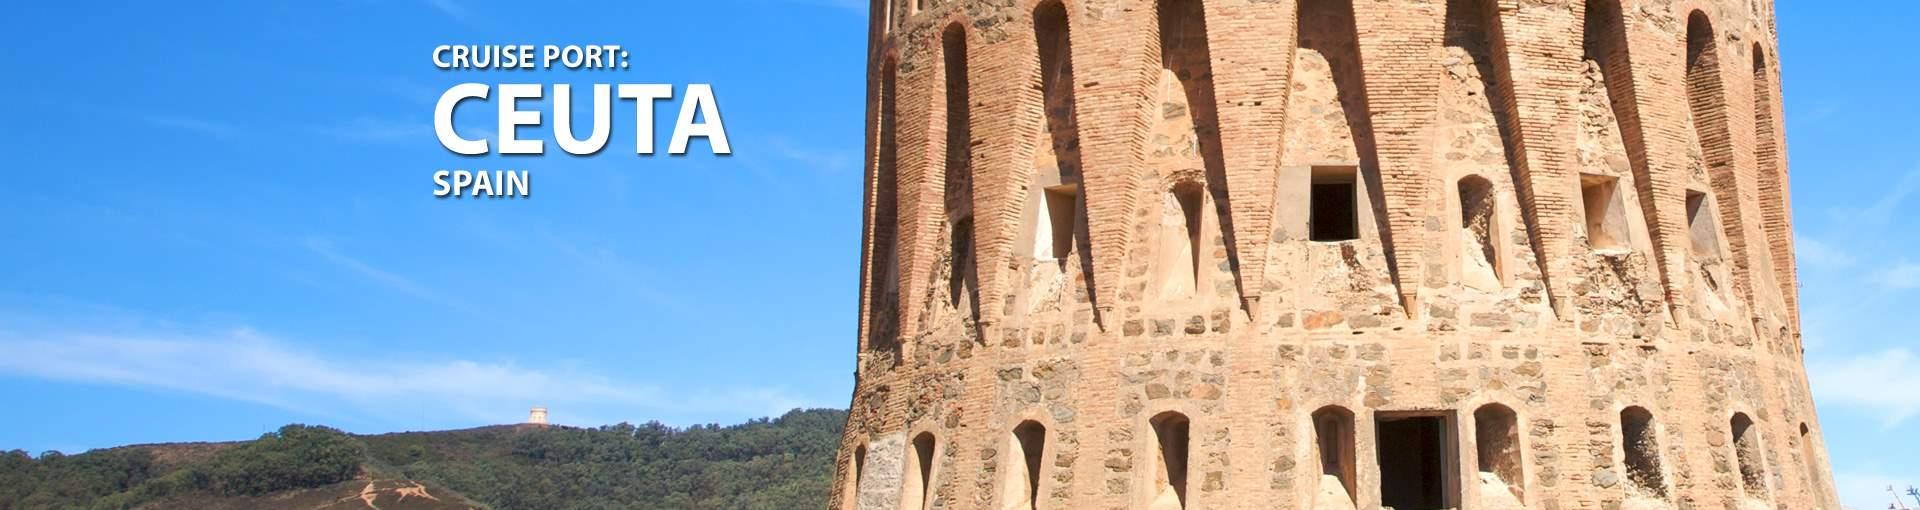 Cruises to Ceuta, Spain